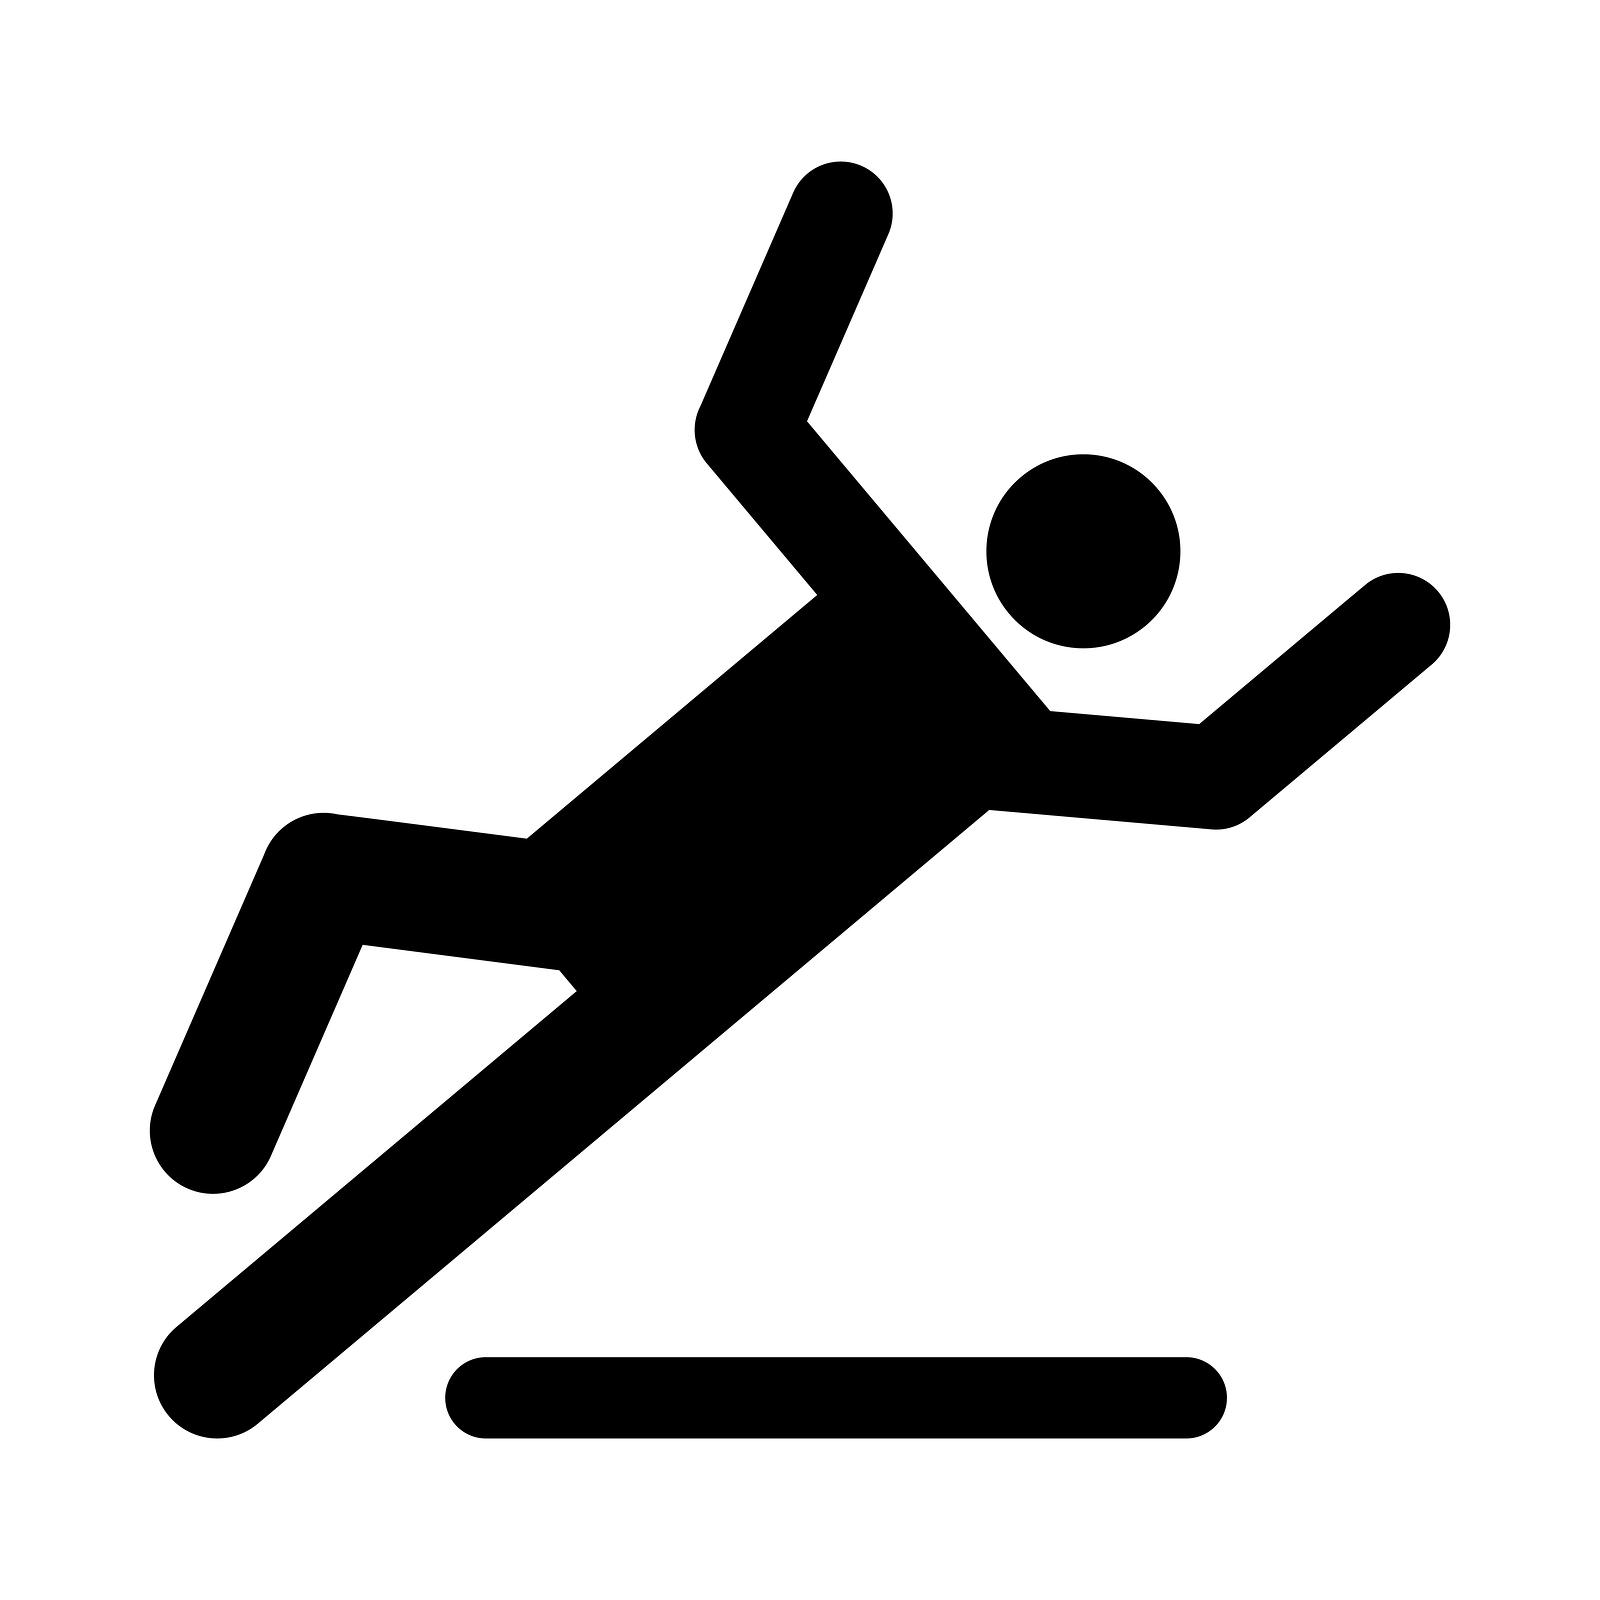 Fallen clipart Patient Falling Clipart Dolman Slip a Personal &